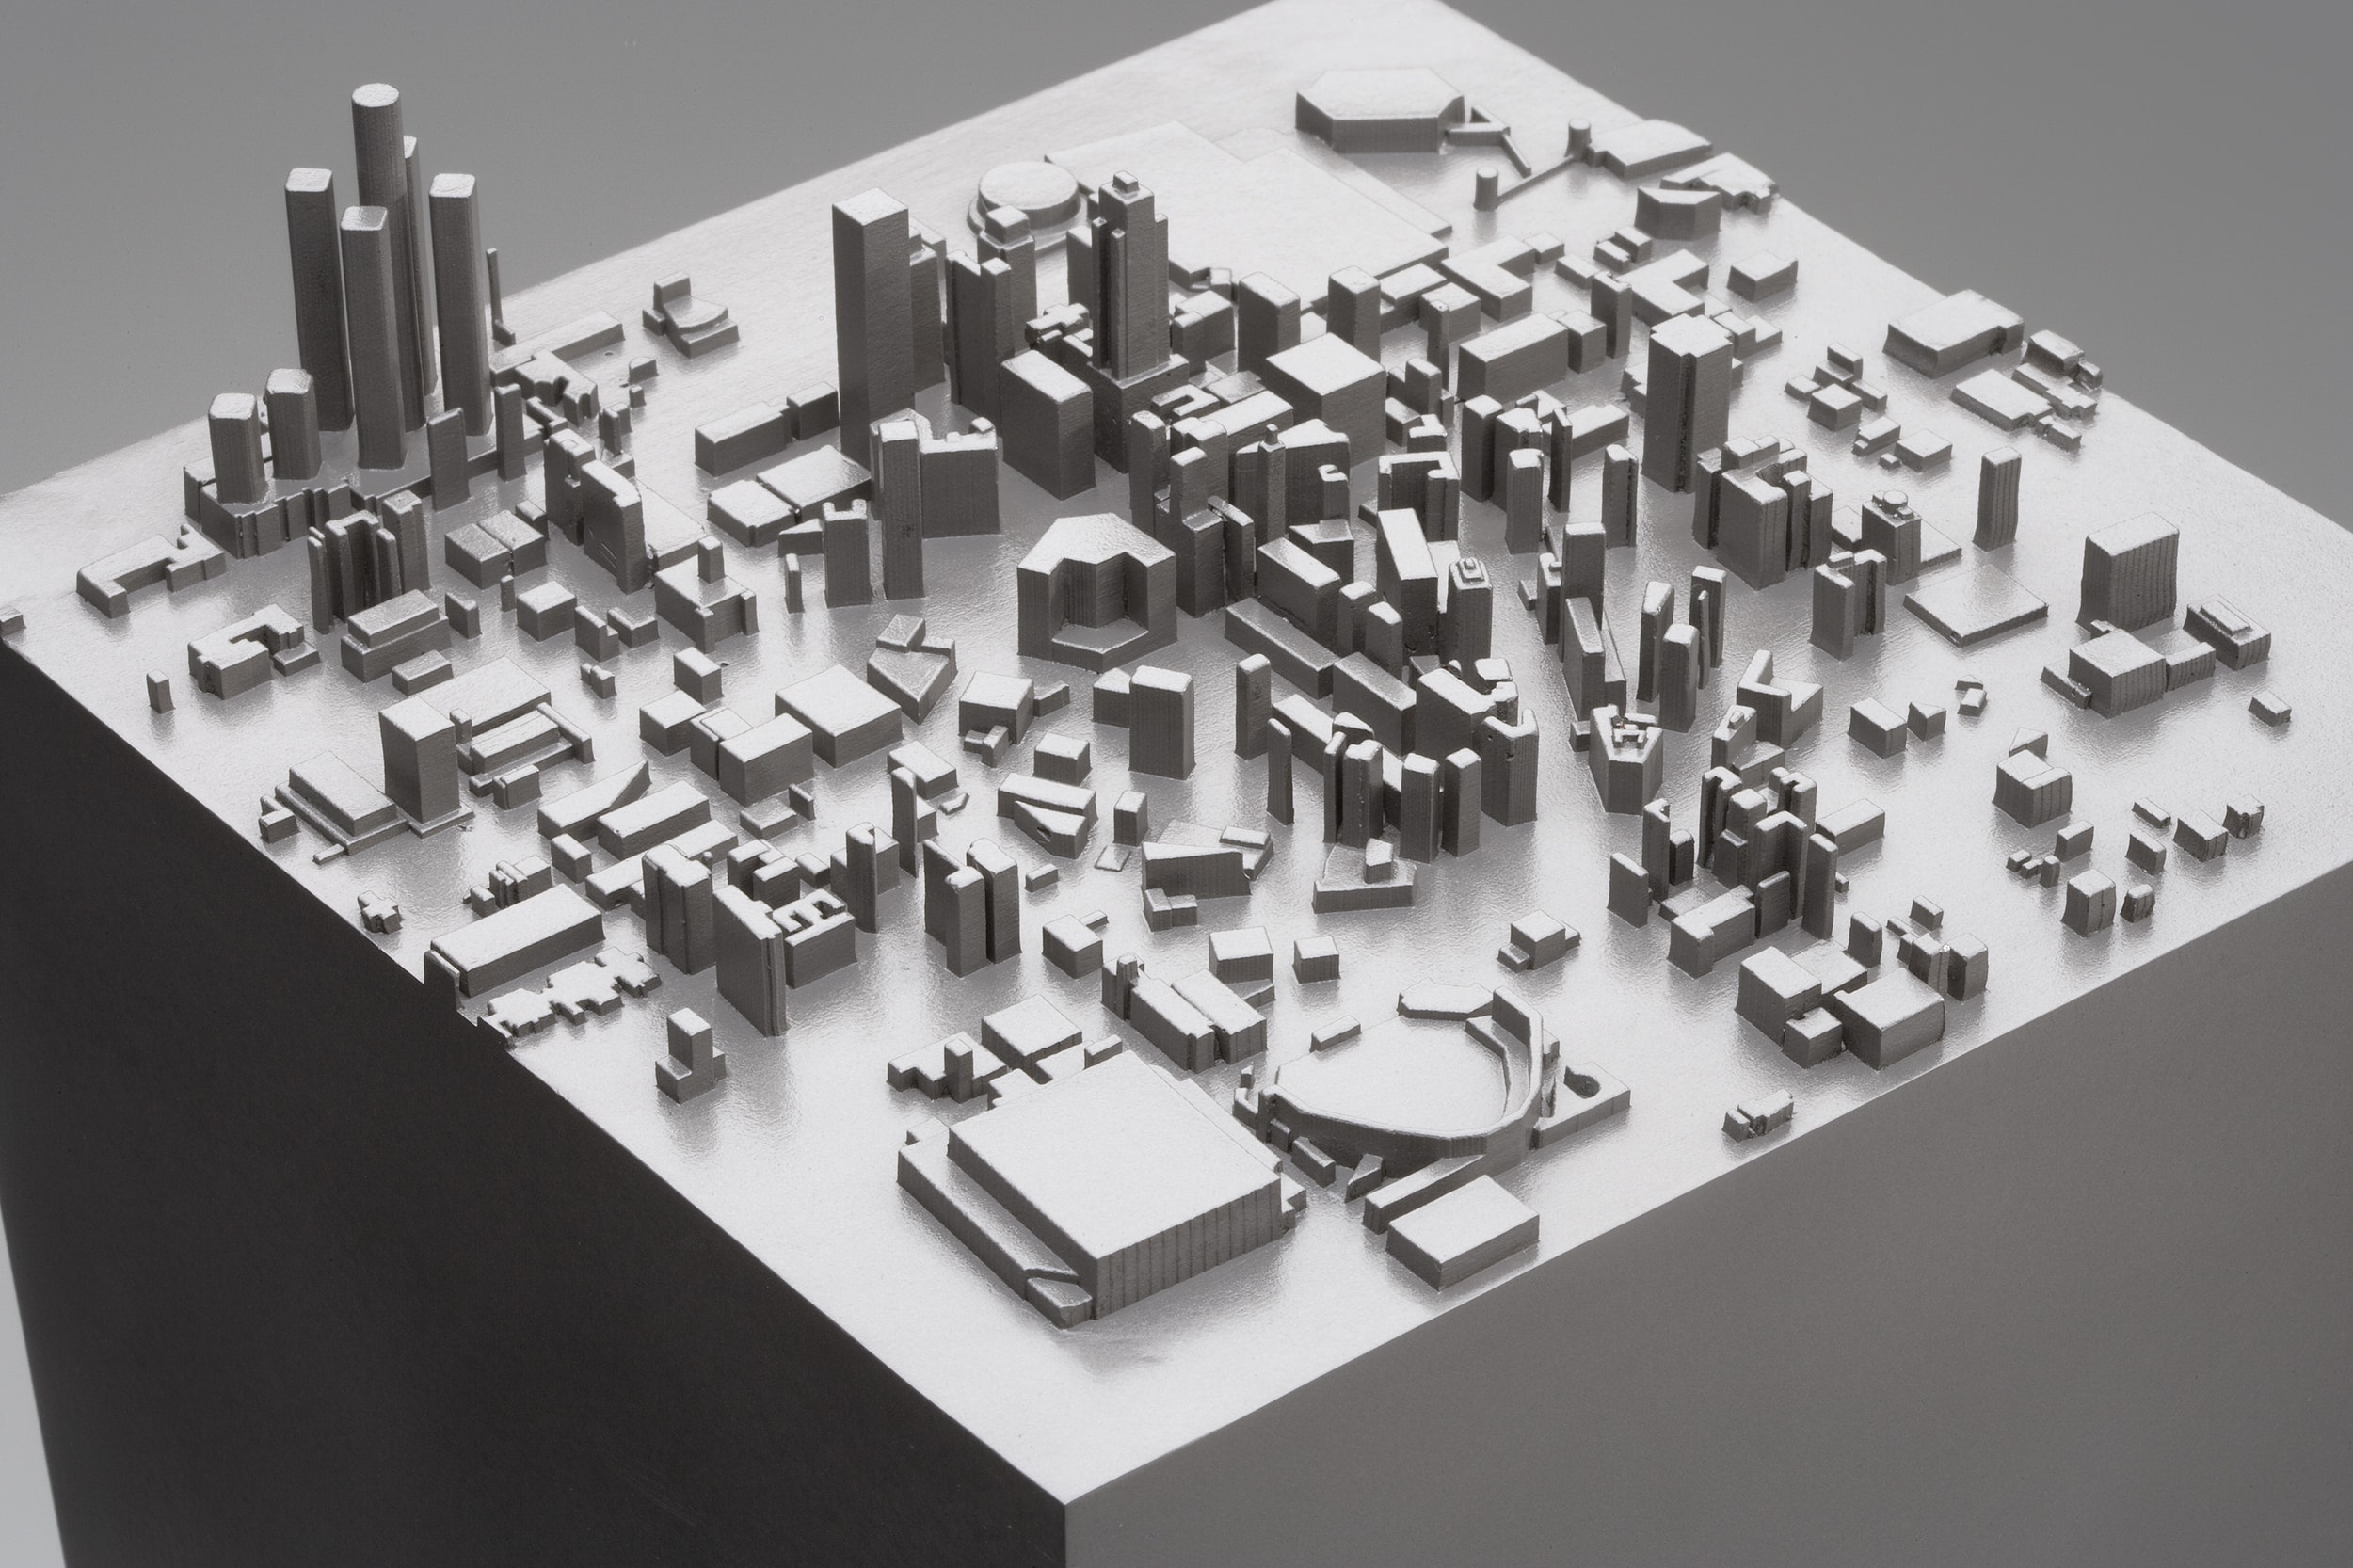 Recasting Detroit (detail)